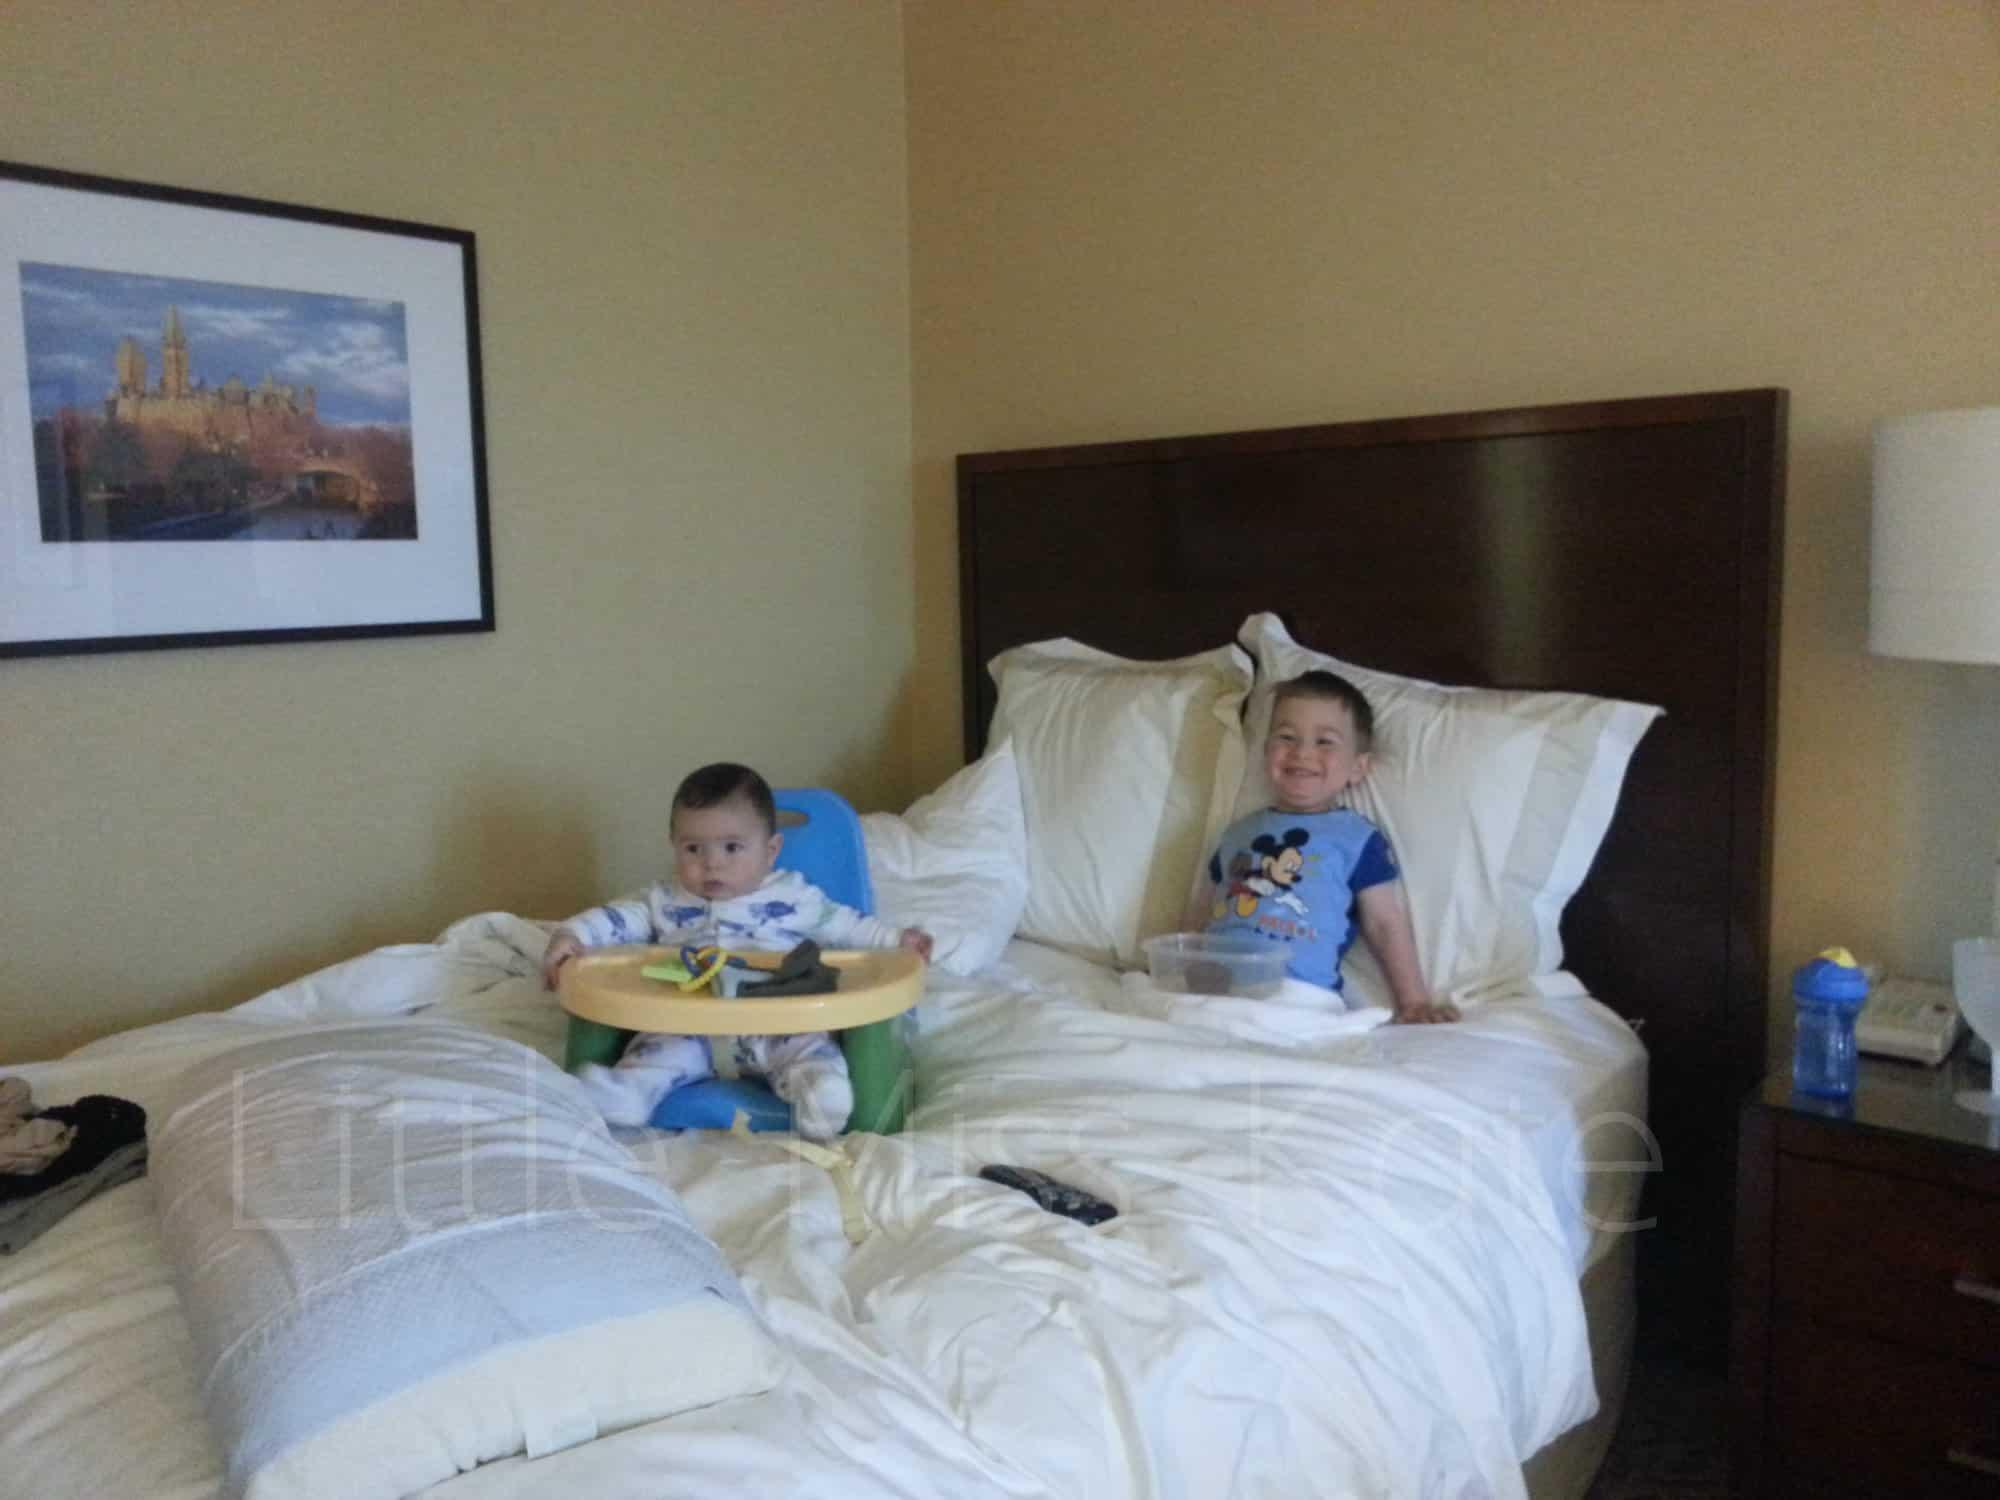 Ottawa Marriott Hotel Review